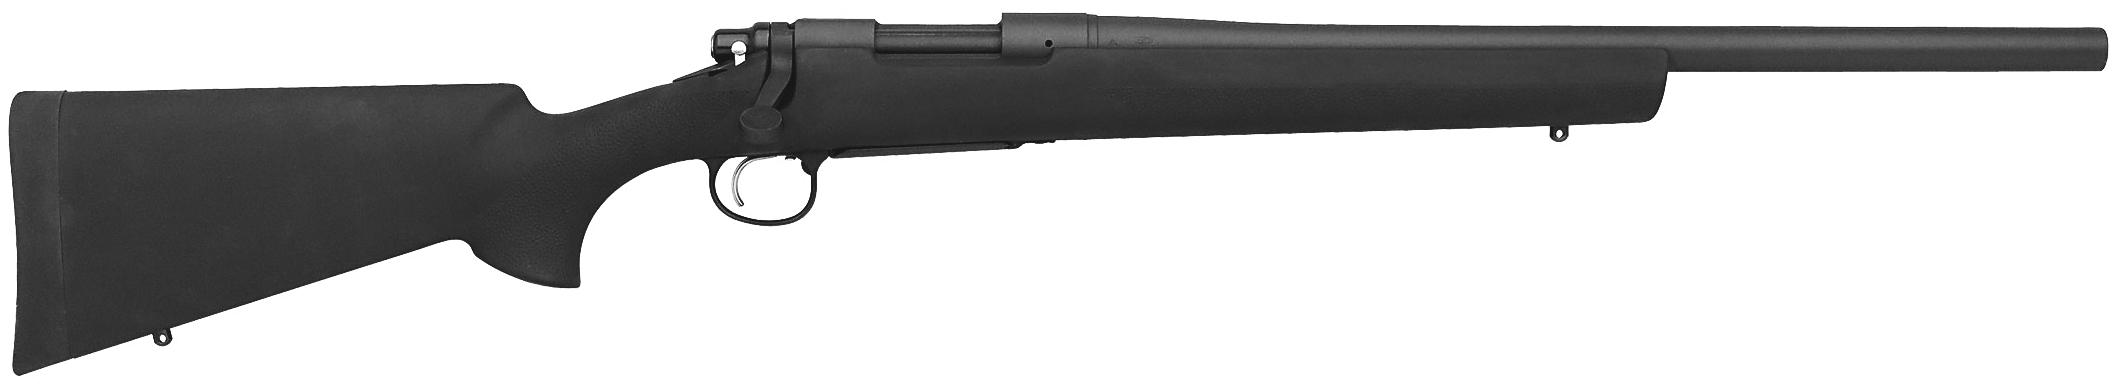 REMINGTON ARMS COMPANY, INC  MODEL 700 SERIES Models :: Gun